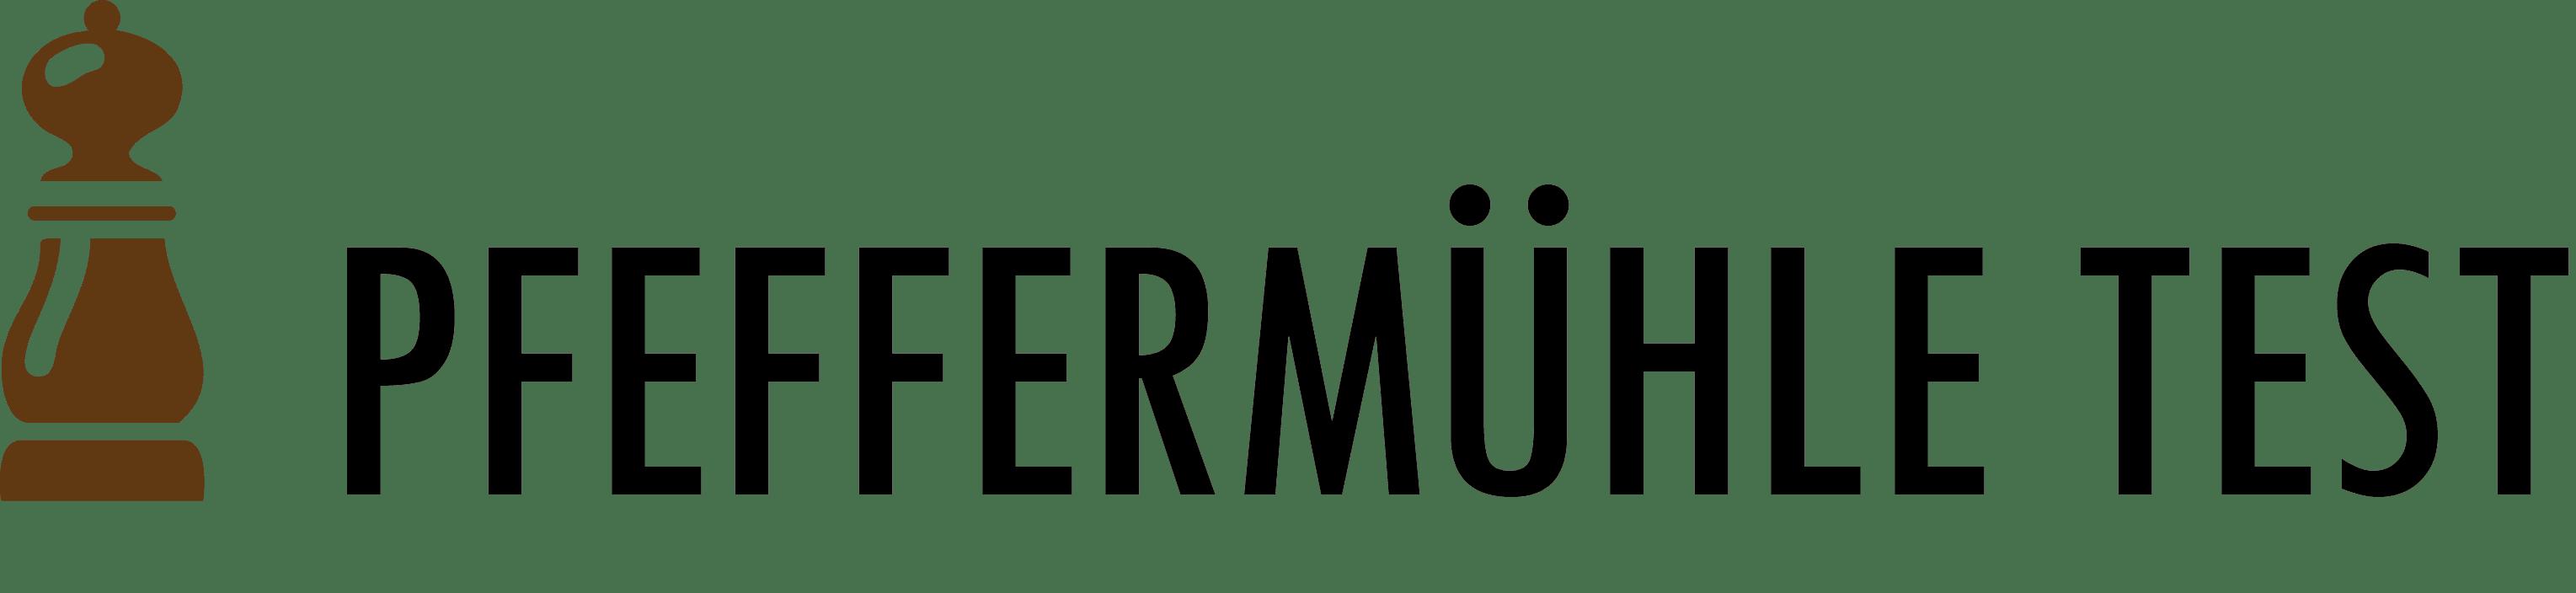 Pfeffermühle Test